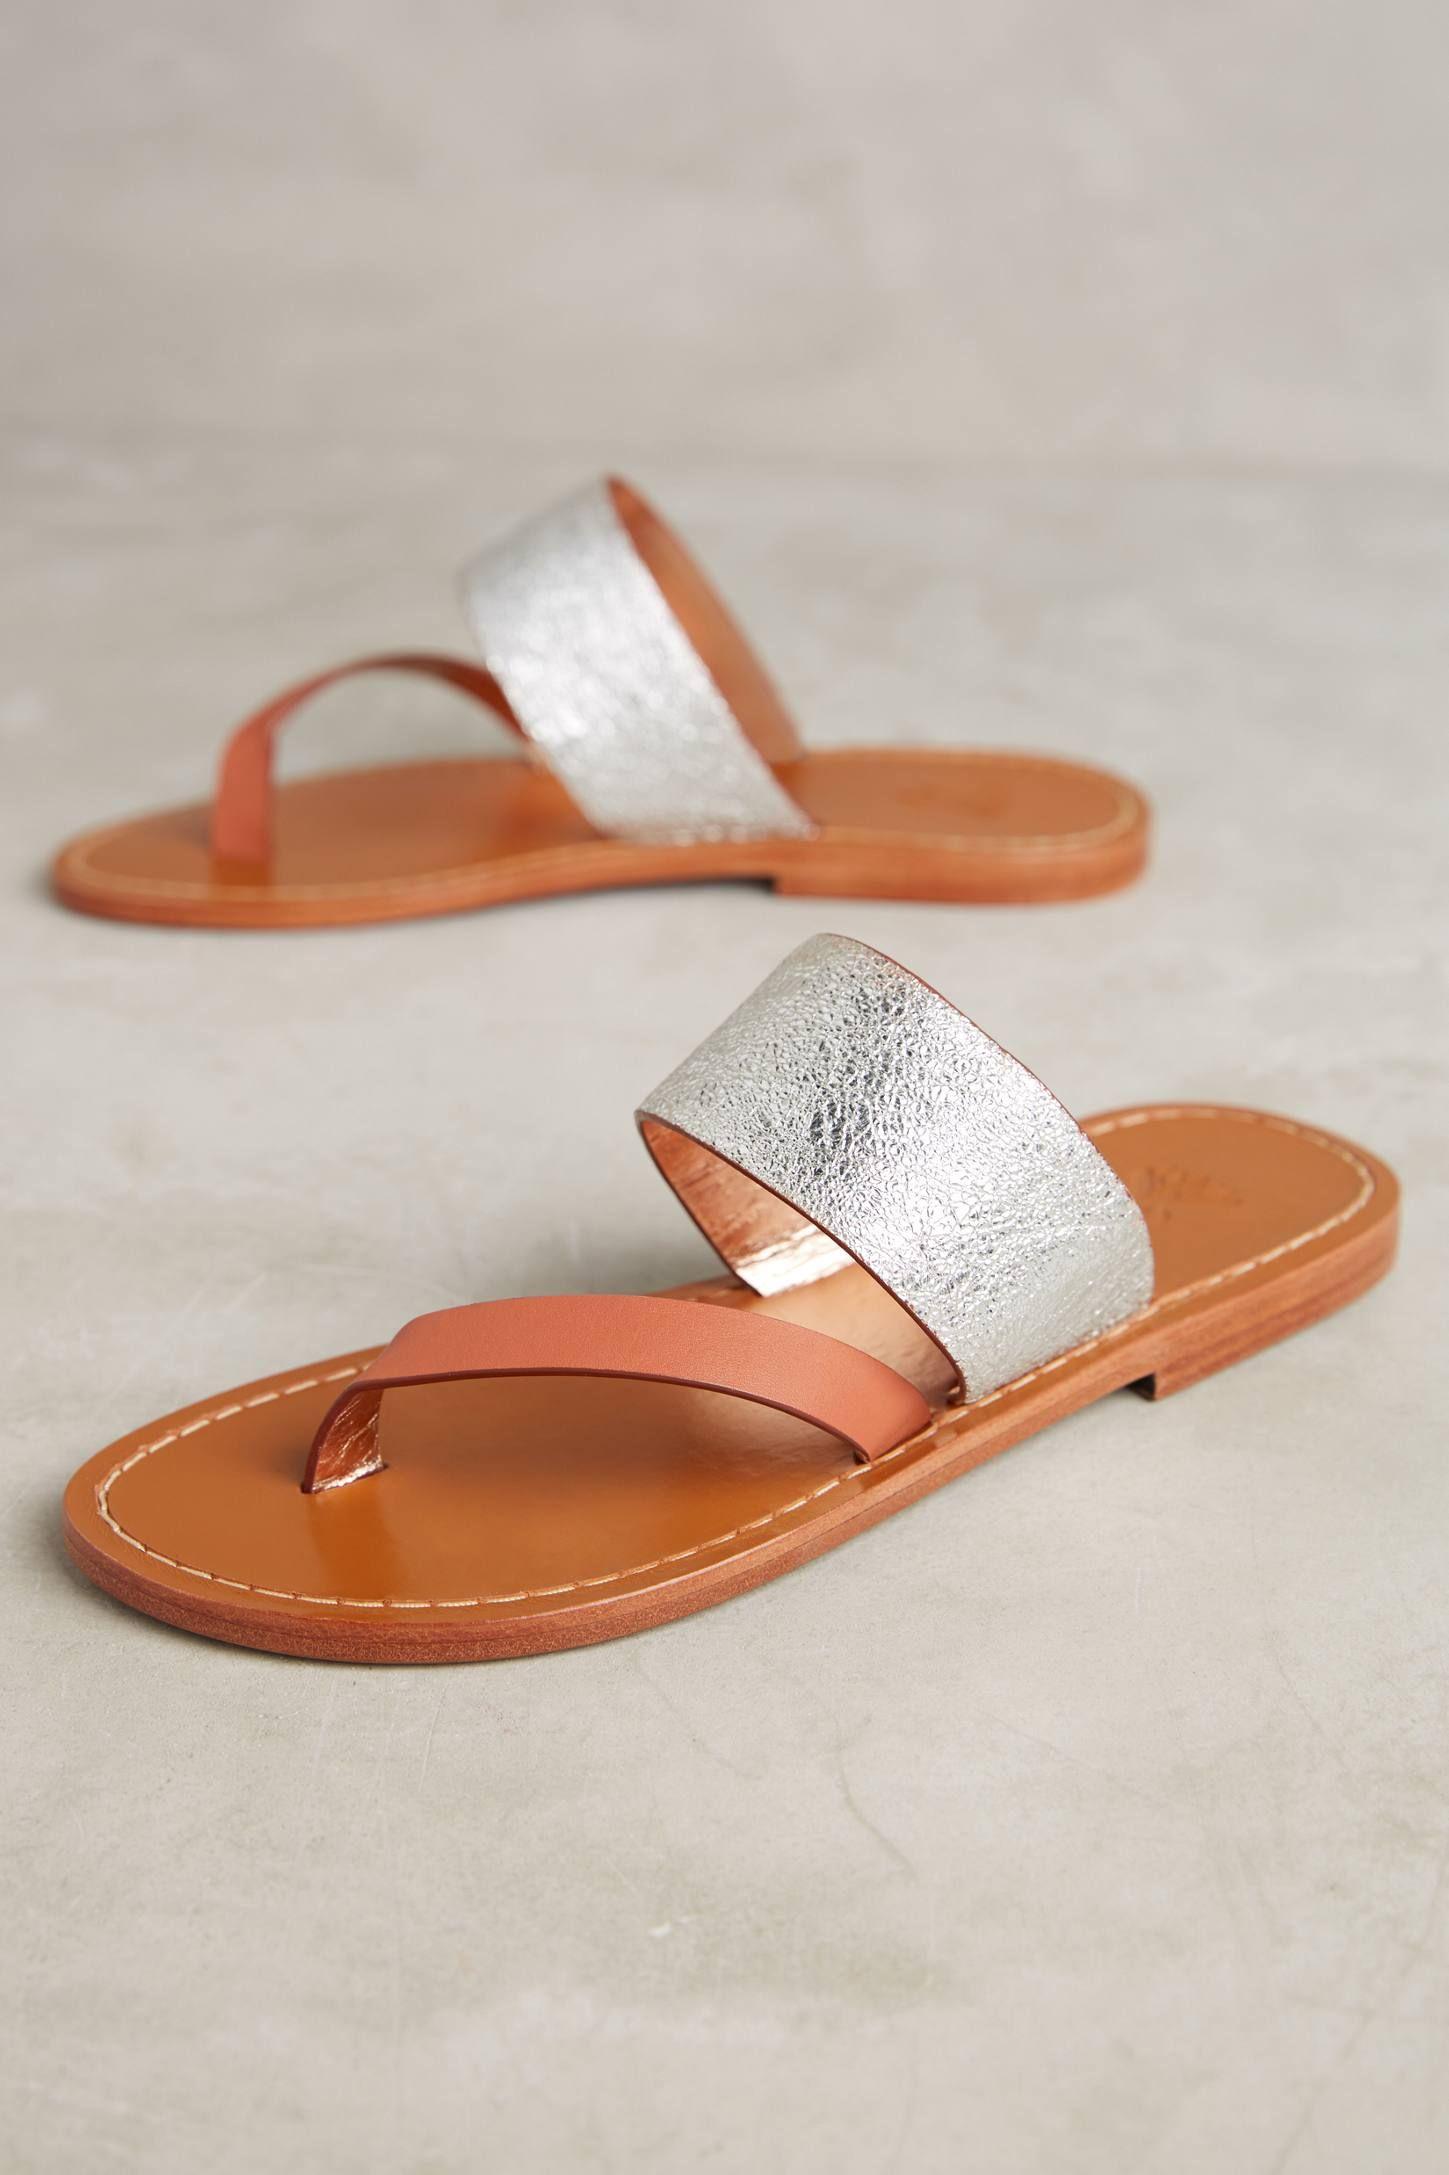 Sanchita Berberis Metallic Sandals   SHOPPING  Spring   Summer 2017 ... 130f7a9743a